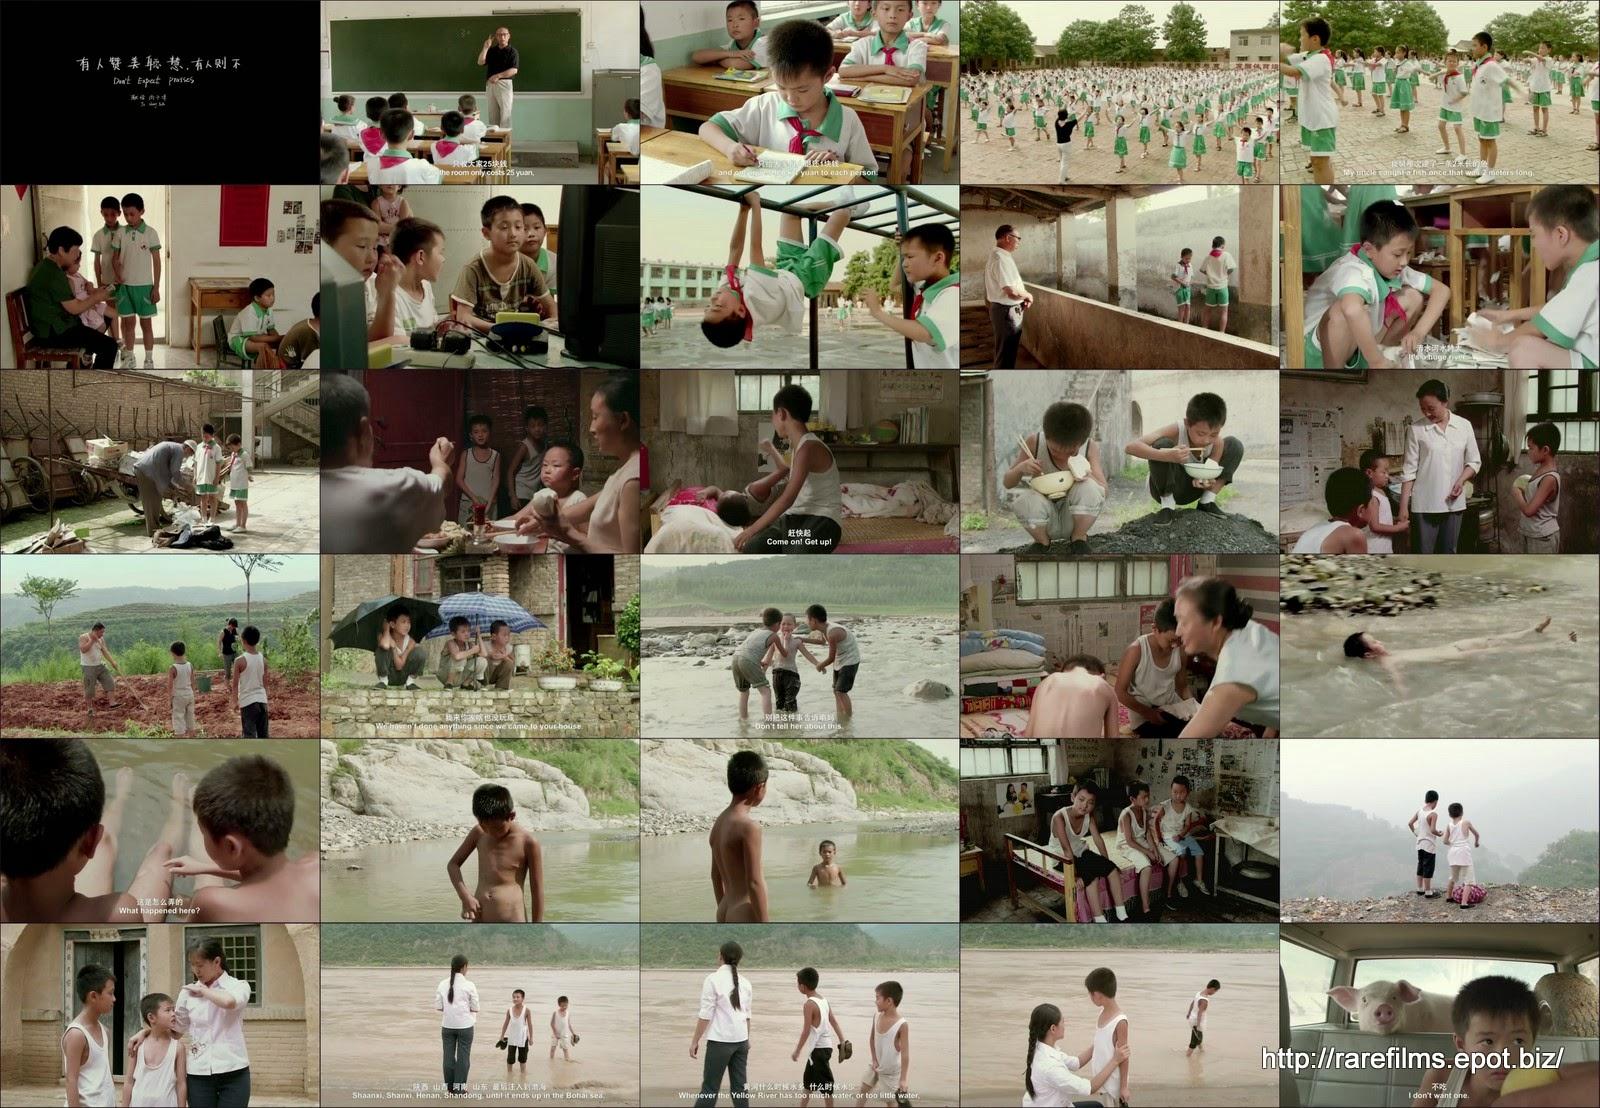 Не ожидайте похвалы / Hwan-ho-bul-ga / Don't Expect Praises. 2012.